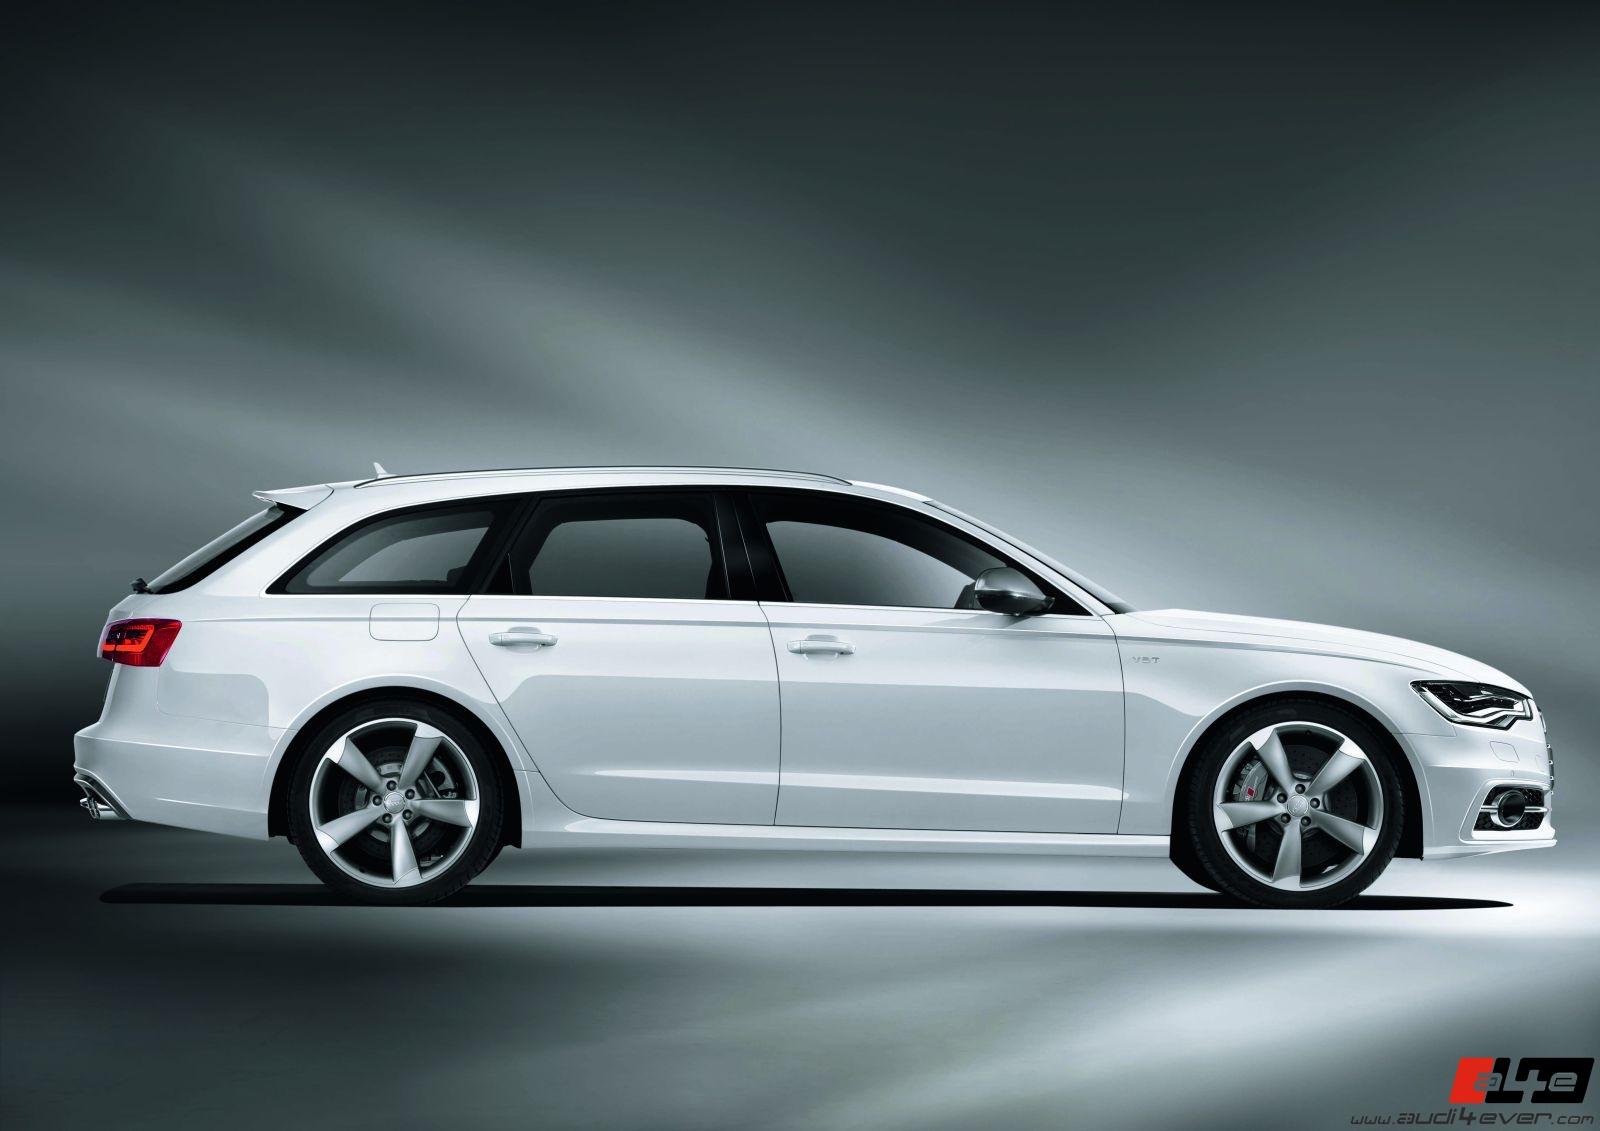 A4e Gallery Audi A6 C7 Audi S6 C7 Avant